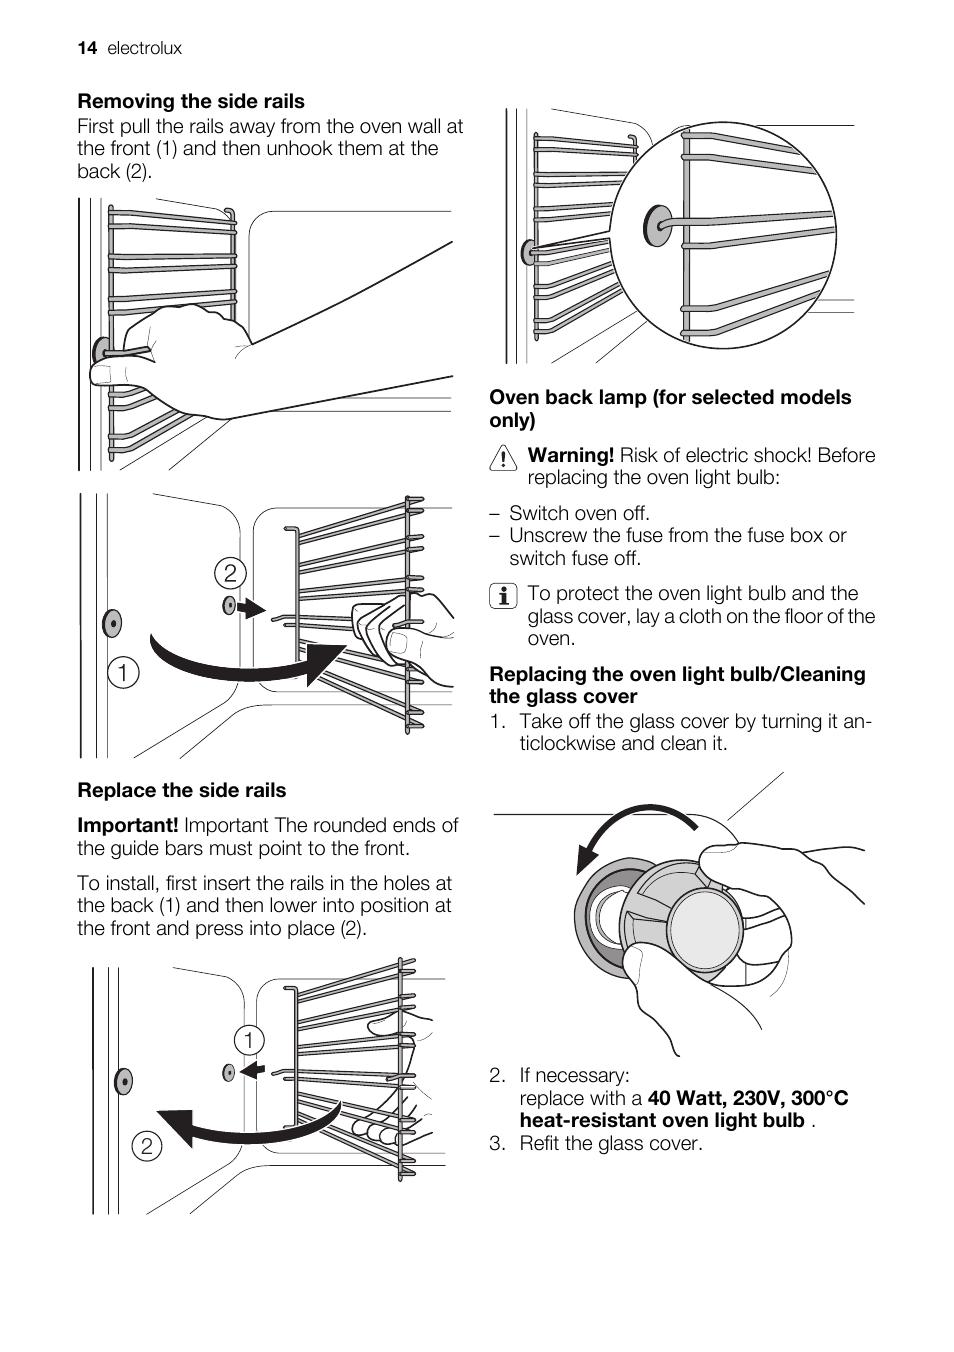 Electrolux Eou43003 User Manual Page 14 24